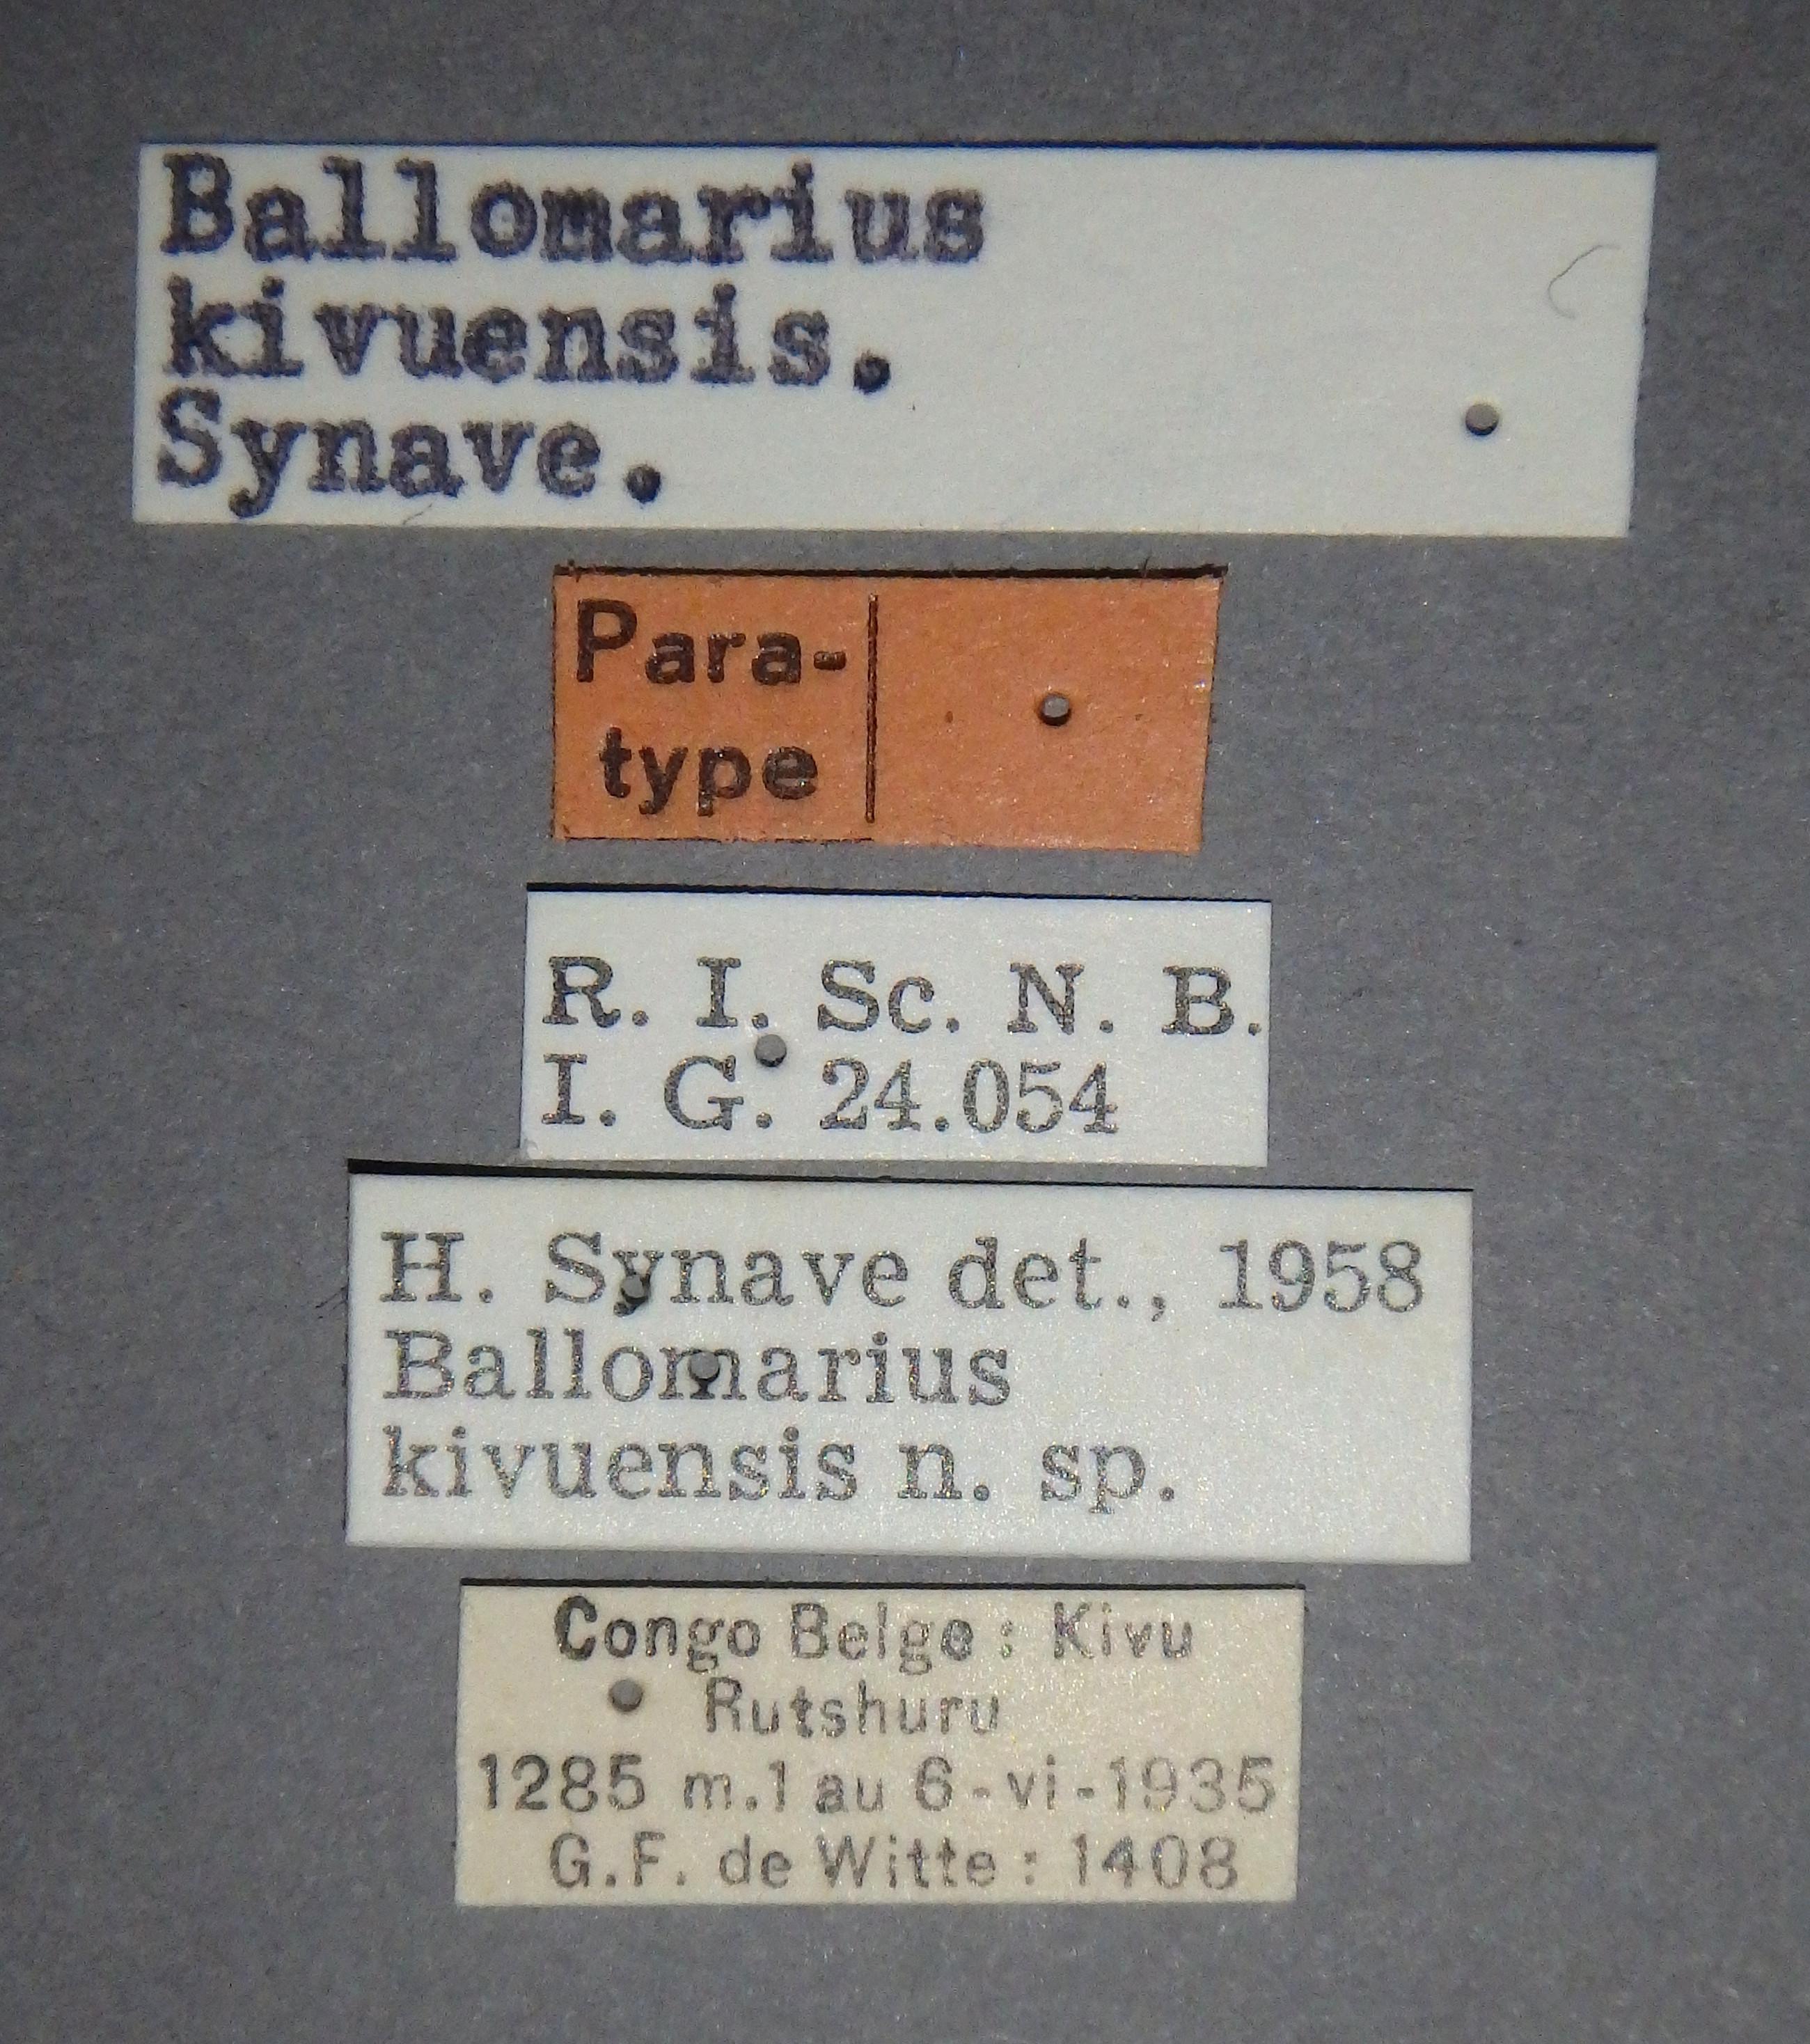 Ballomarius kivuensis pt2 Lb.JPG